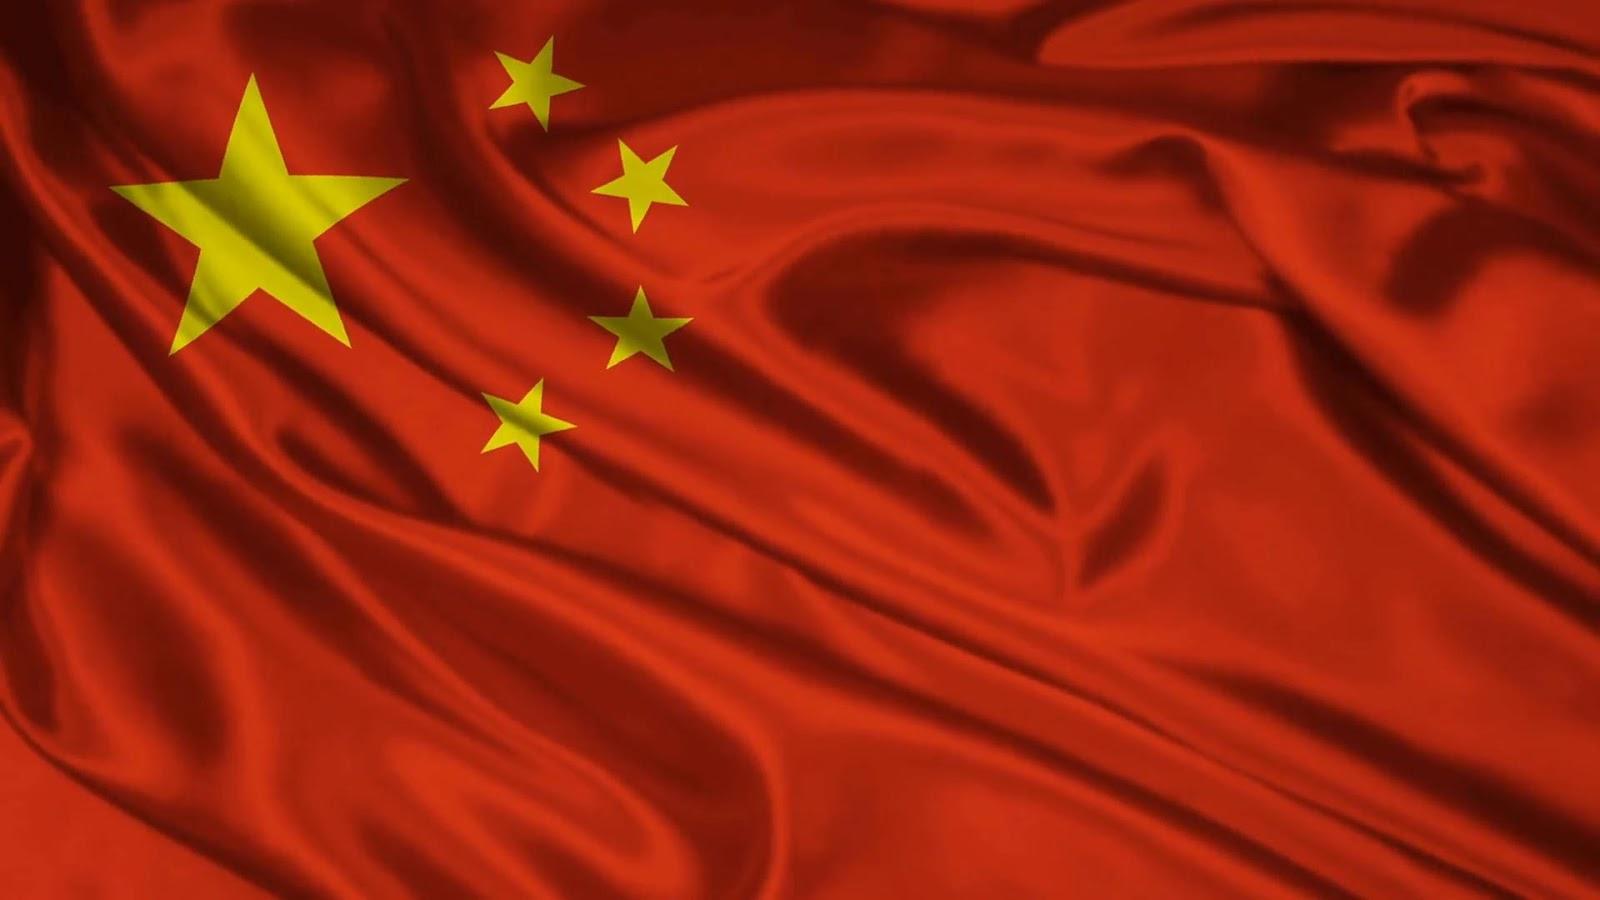 India Blokir Tiktok dan 58 Aplikasi, China Mengaku Prihatin